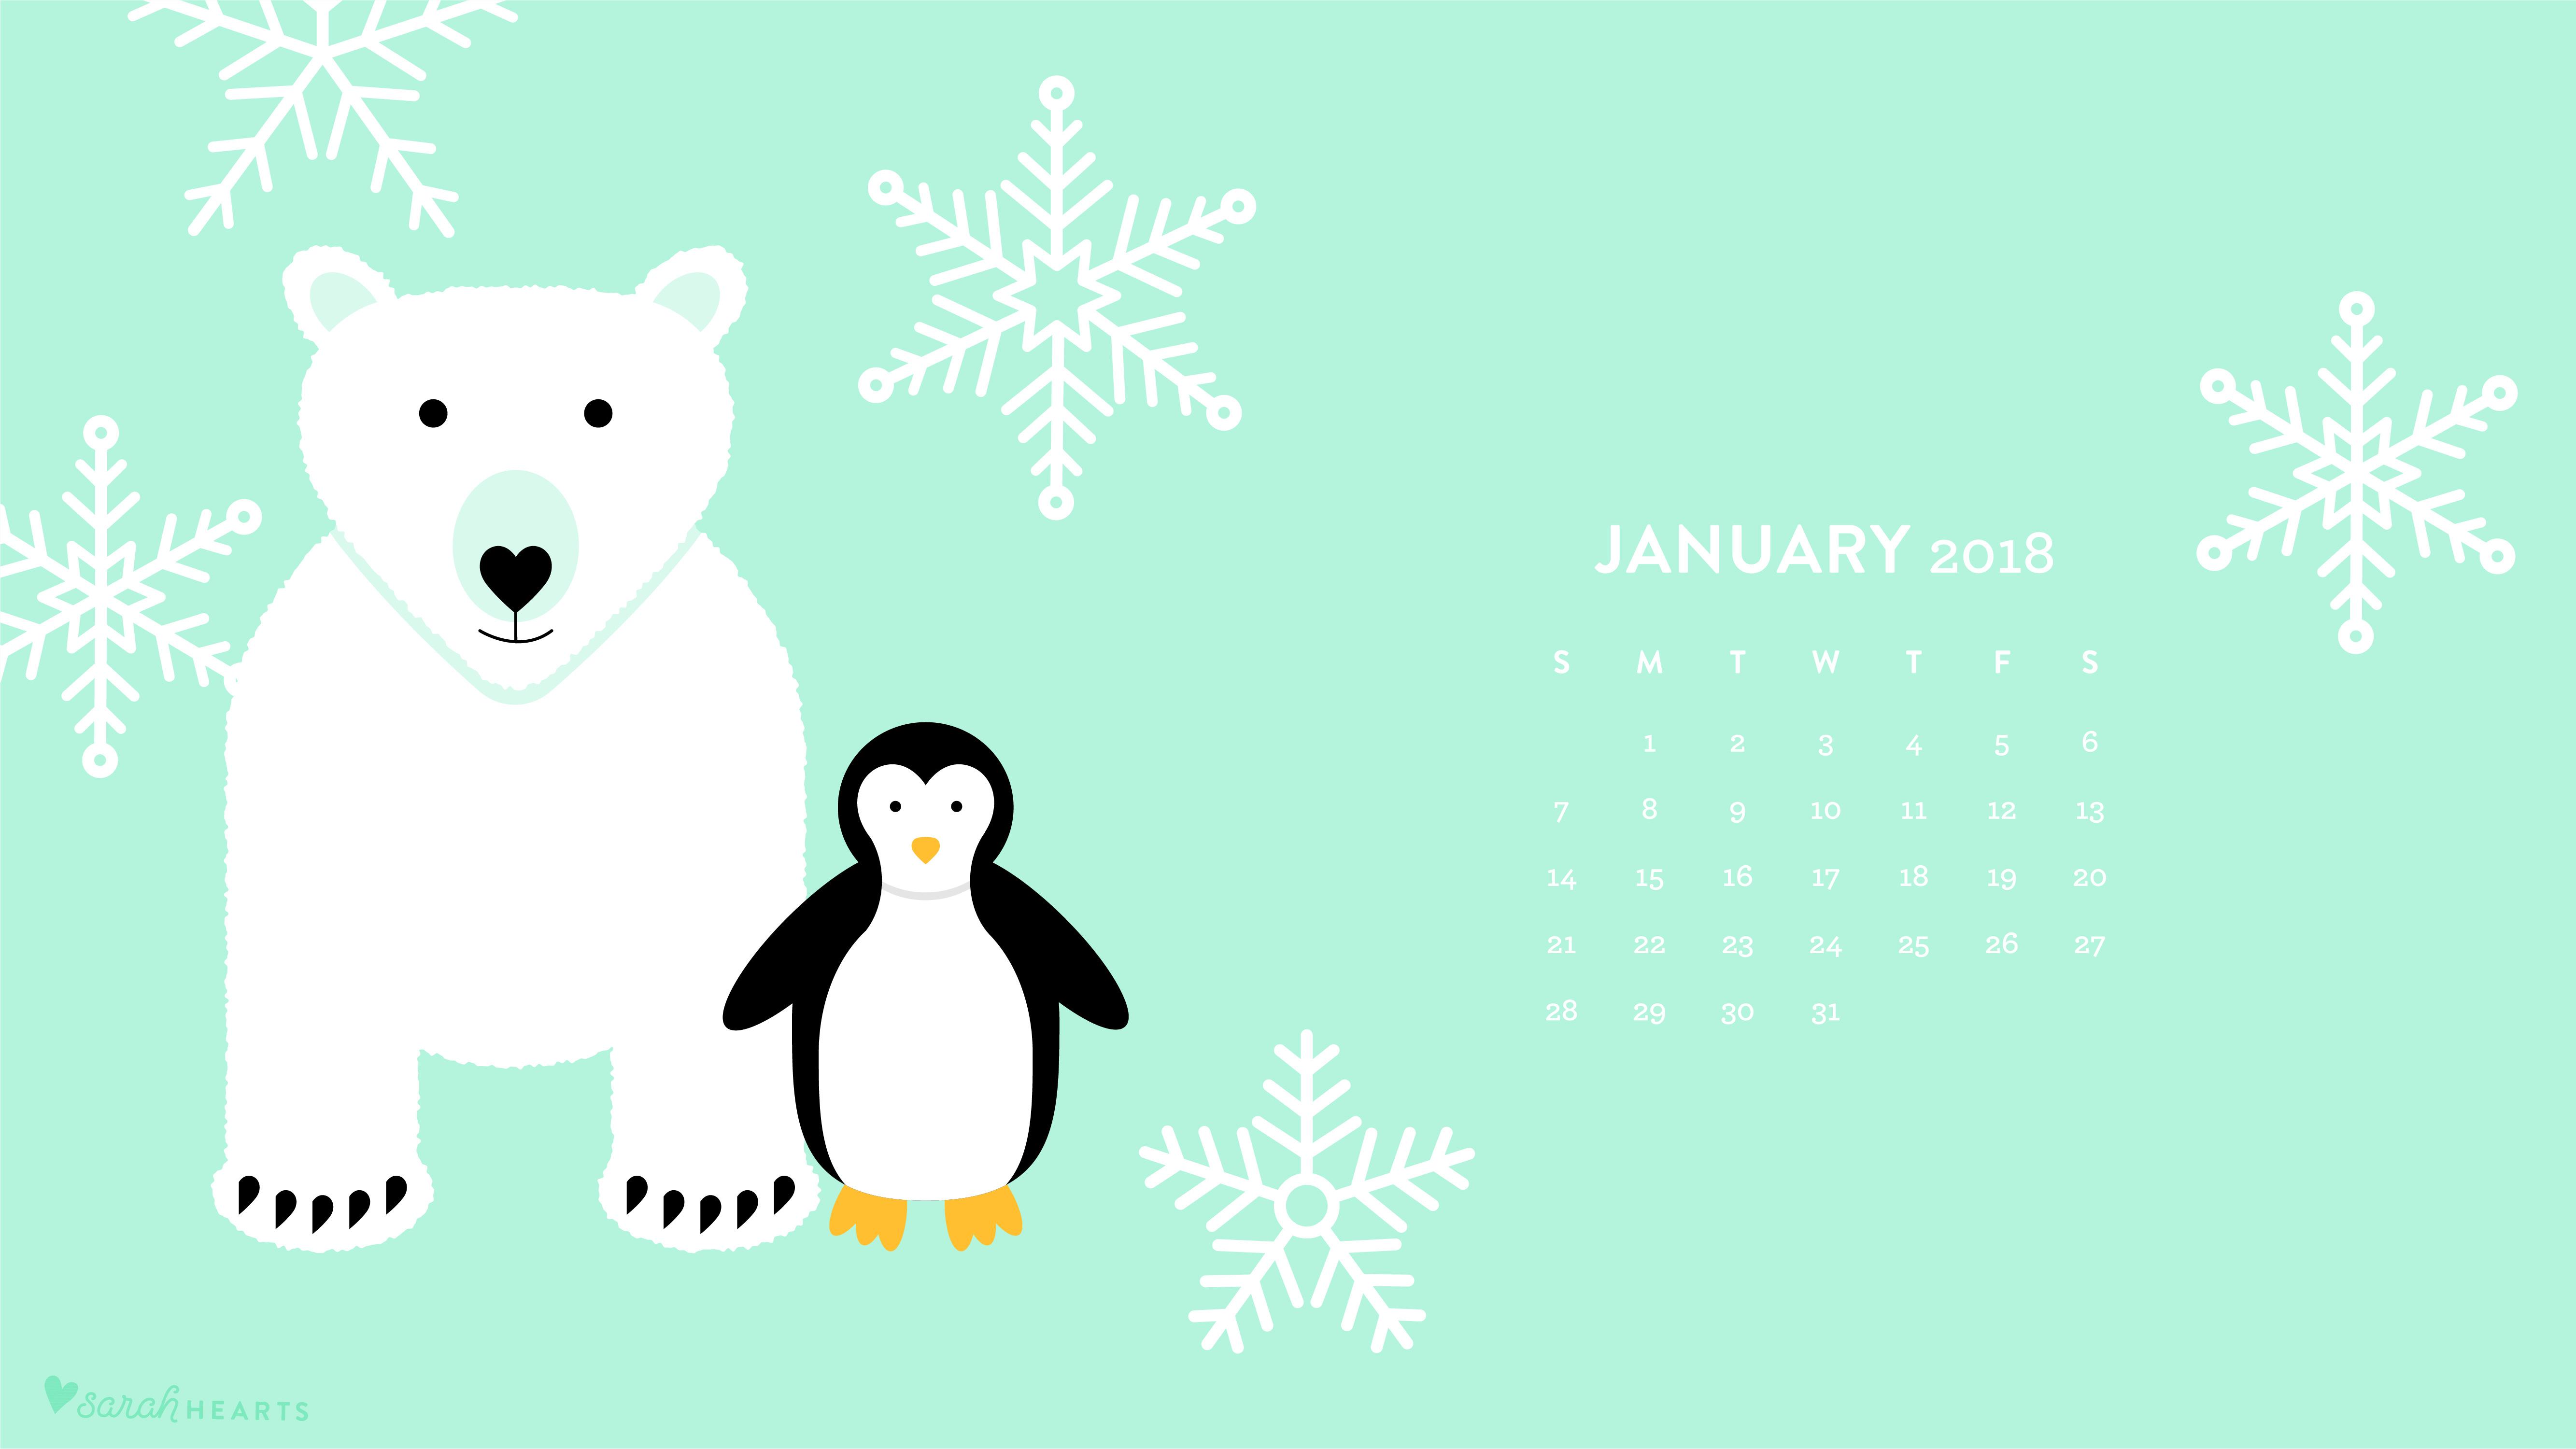 Polar Bear and Penguin January 2018 Calendar Wallpaper 5334x3001